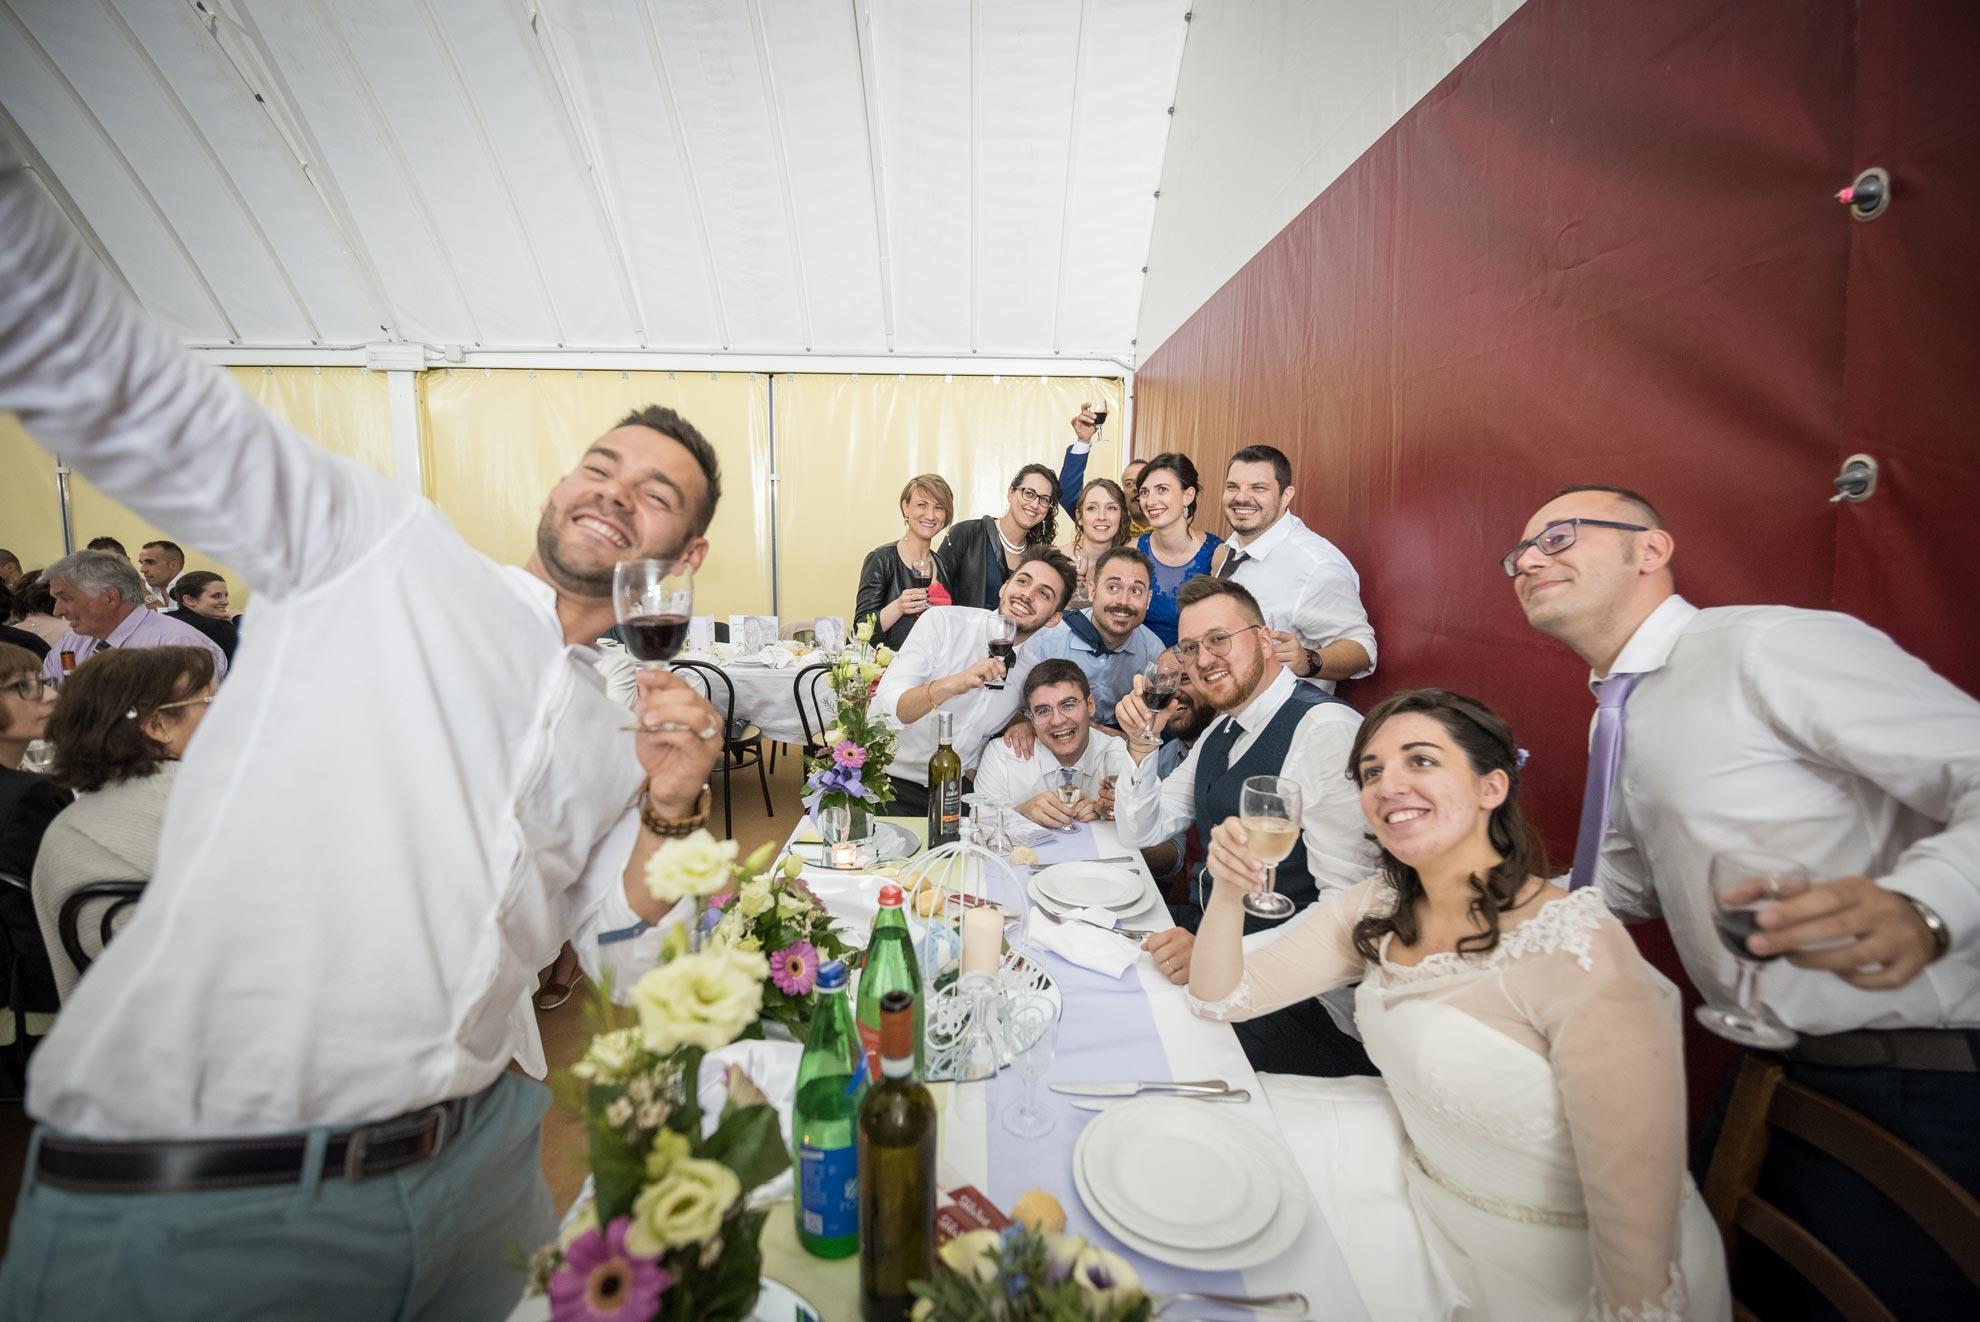 Matrimonio a Narzole Lorenza Diego - DSC 0808 - Fotografo matrimonio nel Roero - Fotografo matrimonio nel Roero